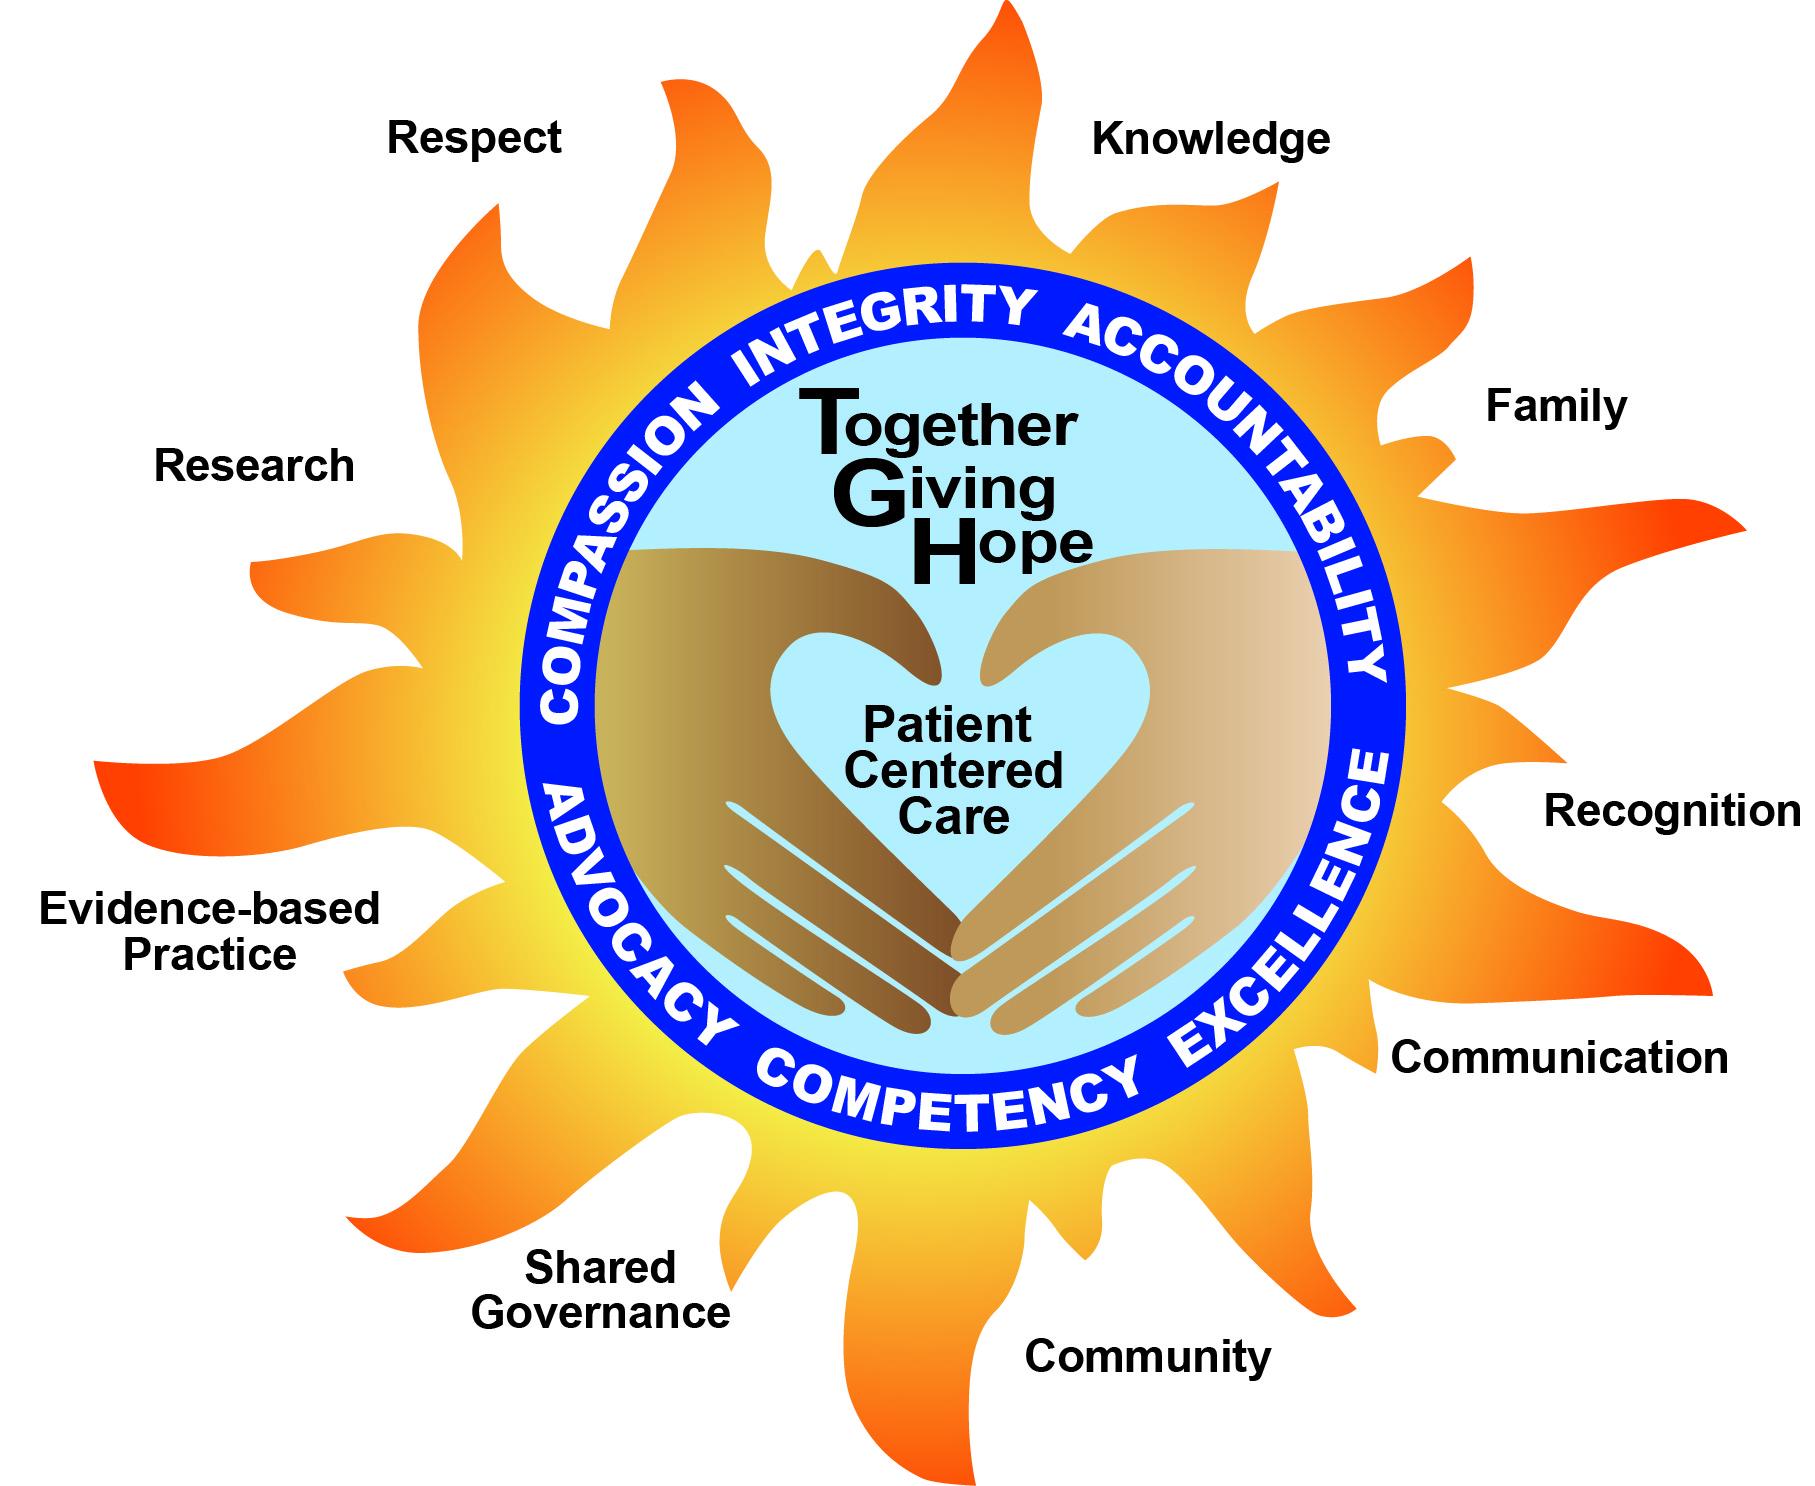 Nursing at TGH | Tampa General Hospital for Nursing Professional Practice Model  75tgx